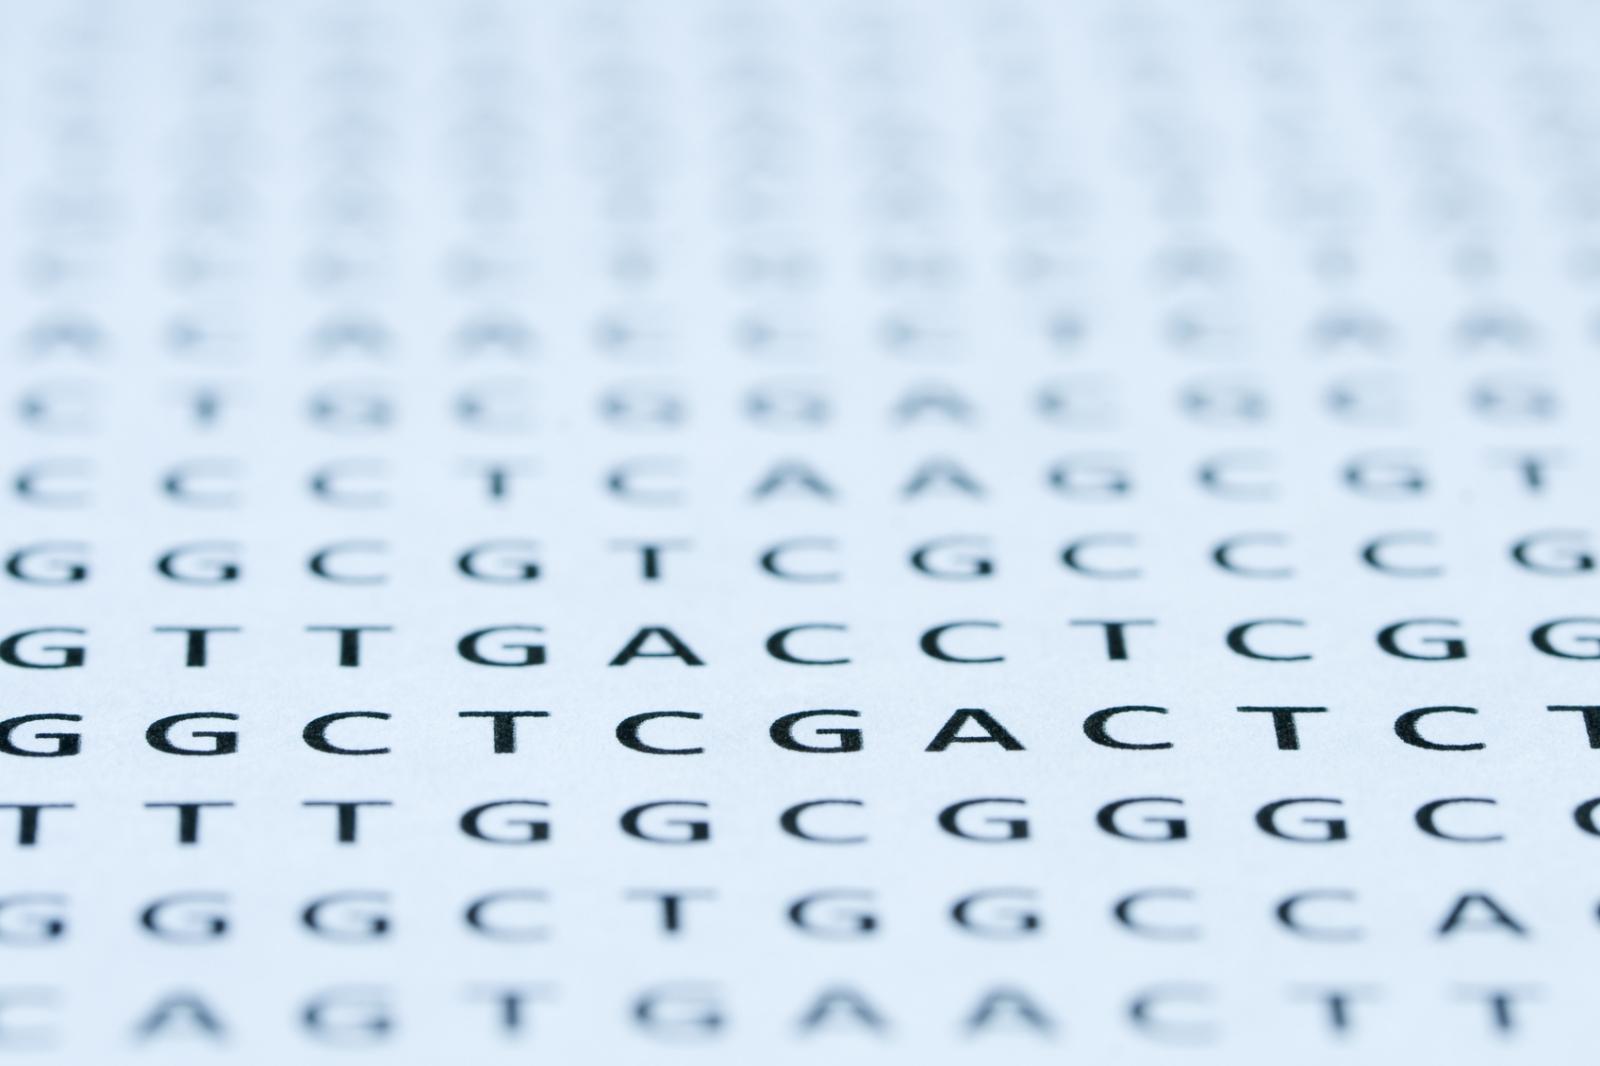 Huntington's disease nucleotide